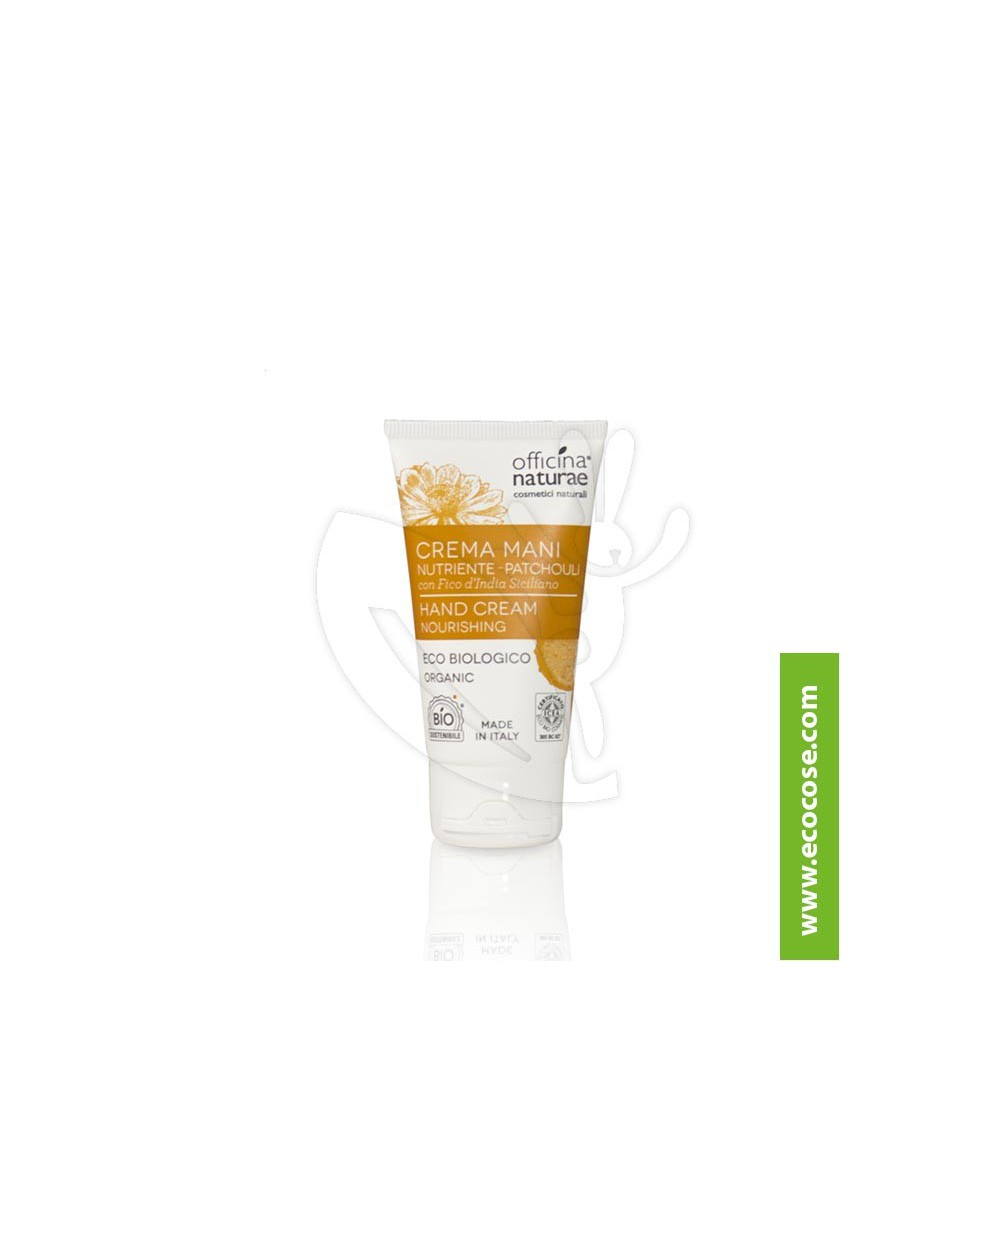 Officina Naturae - Gli Innovattivi - Crema mani nutriente patchouli